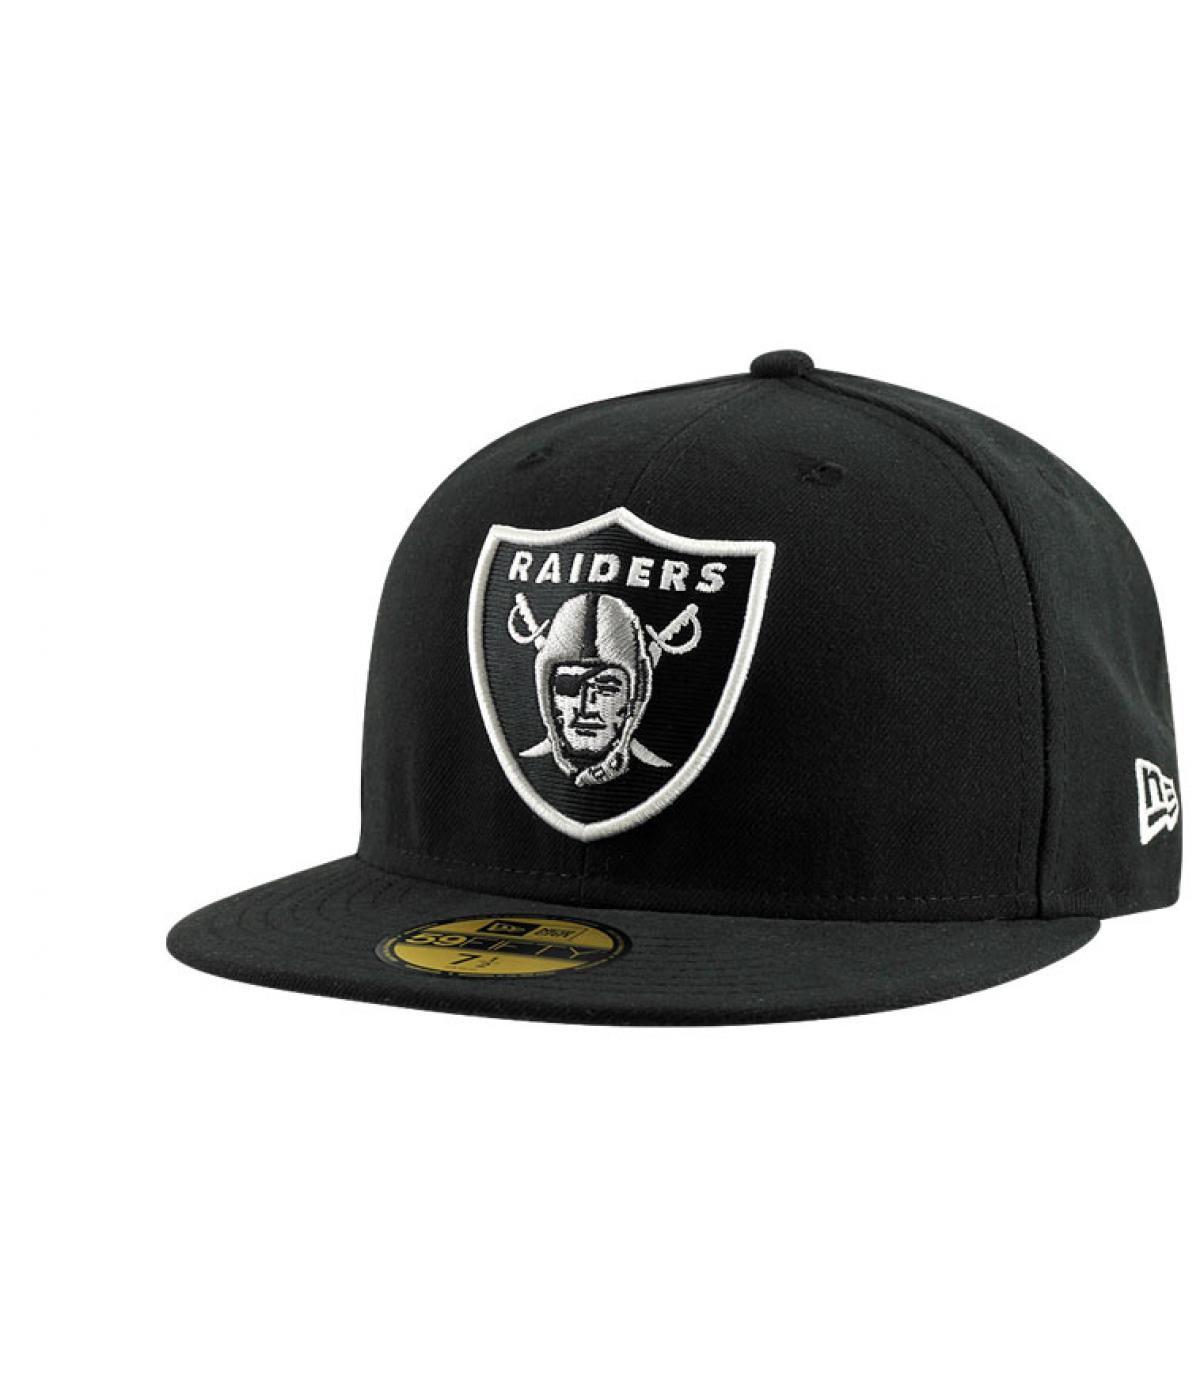 Details Cap Raiders zwart - afbeeling 5